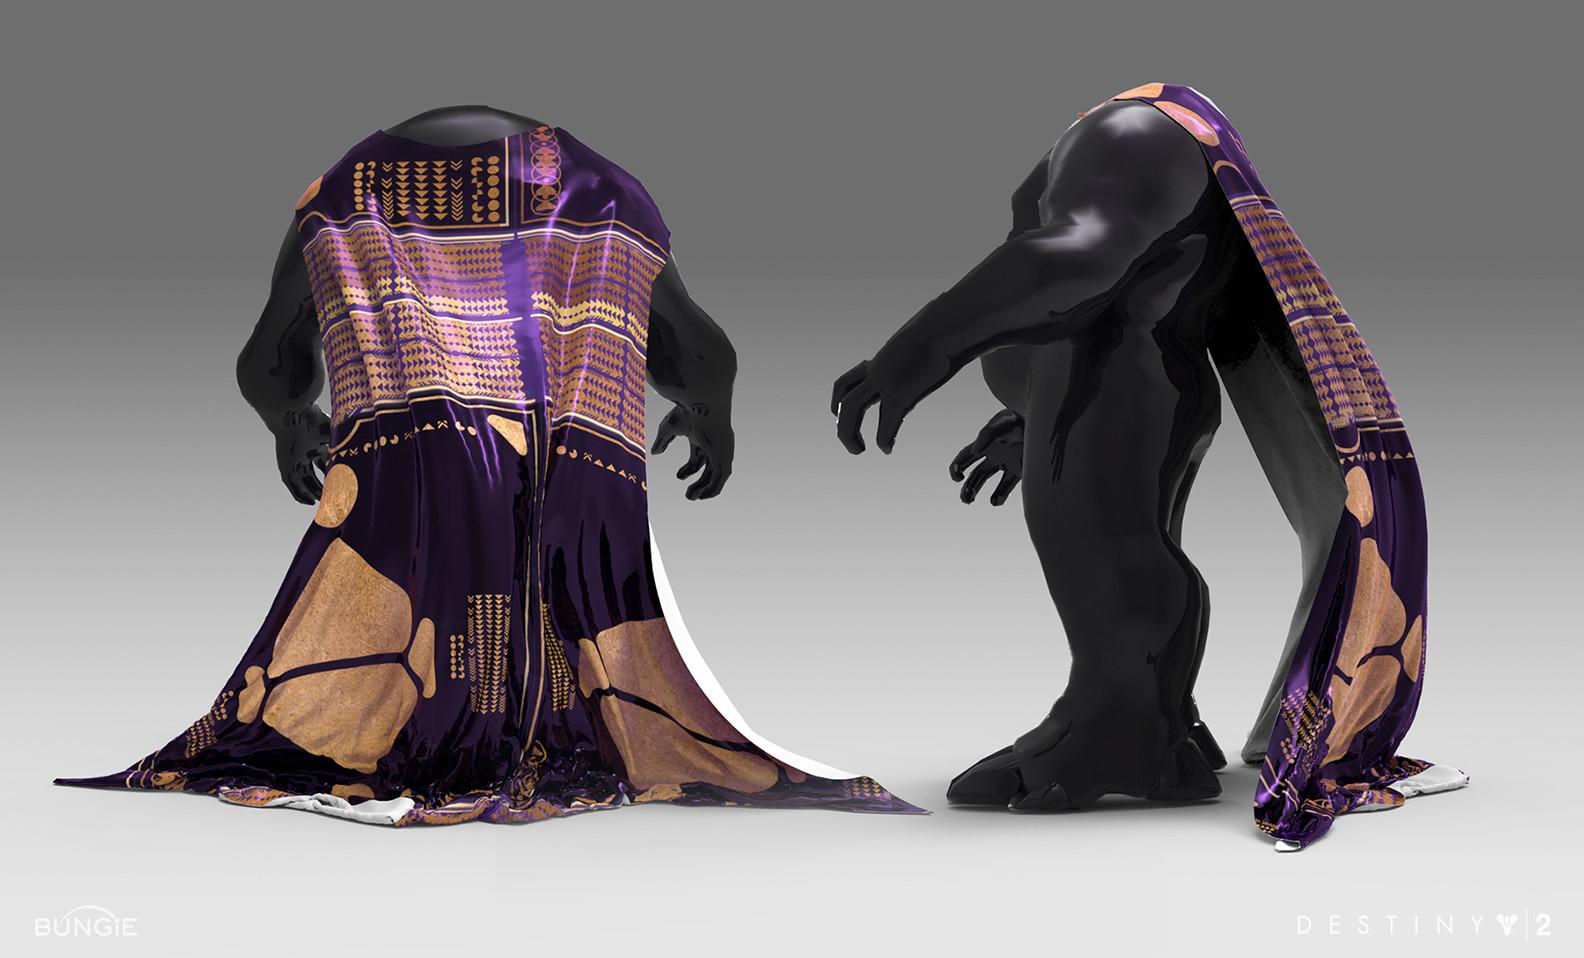 destiny 2 concept art by joseph cross concept art world. Black Bedroom Furniture Sets. Home Design Ideas